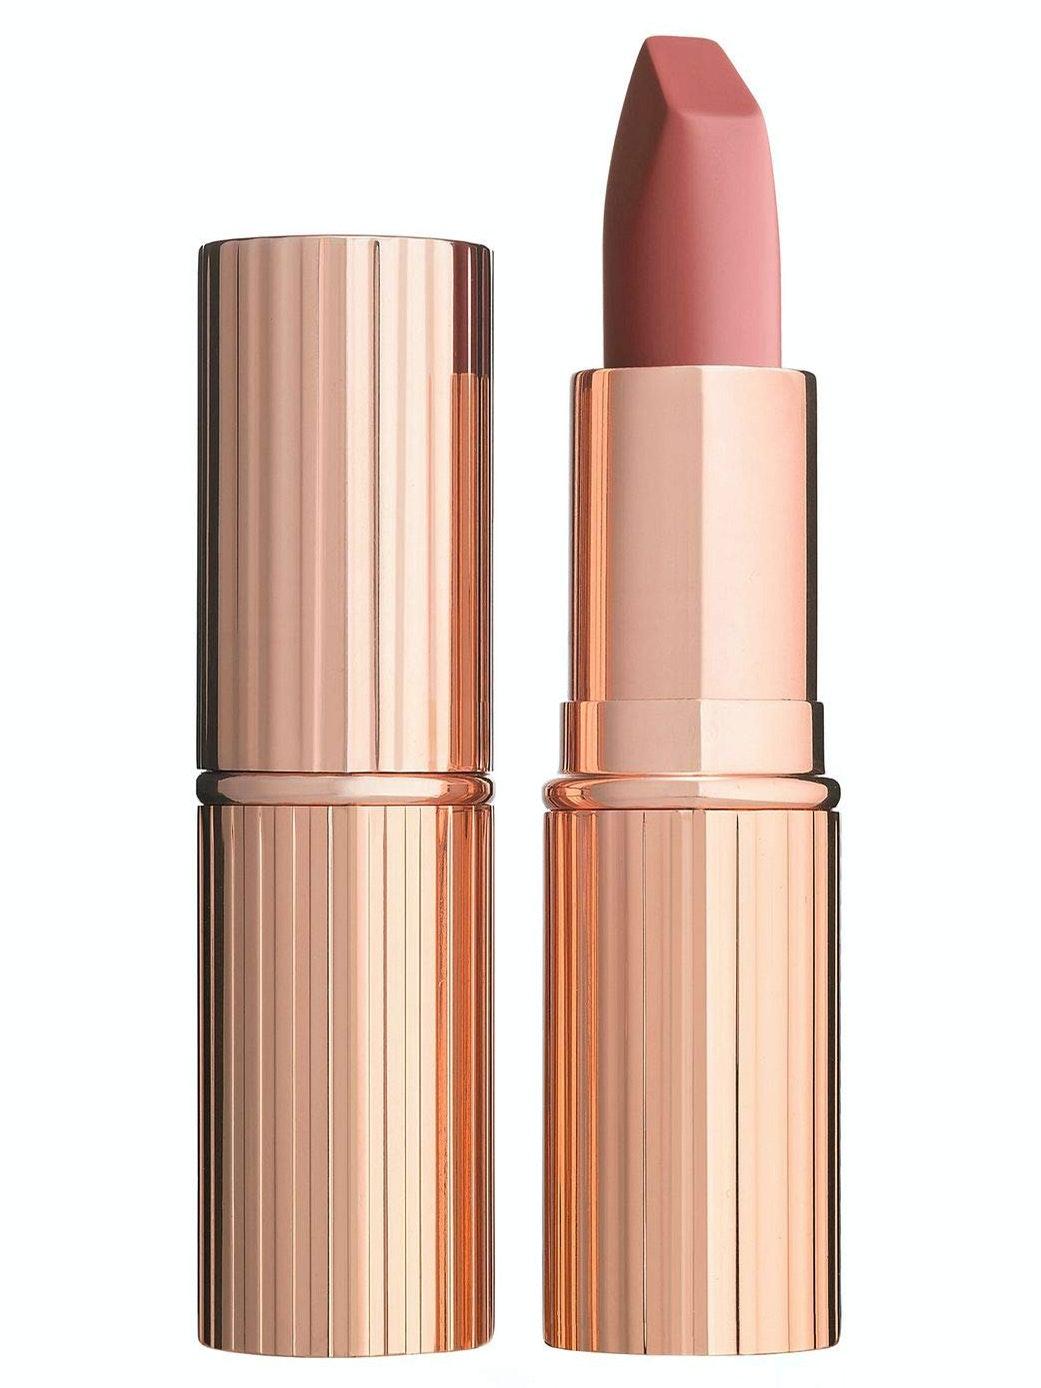 Charlotte Tilbury® Matte Revolution® Lipstick in Pillow Talk